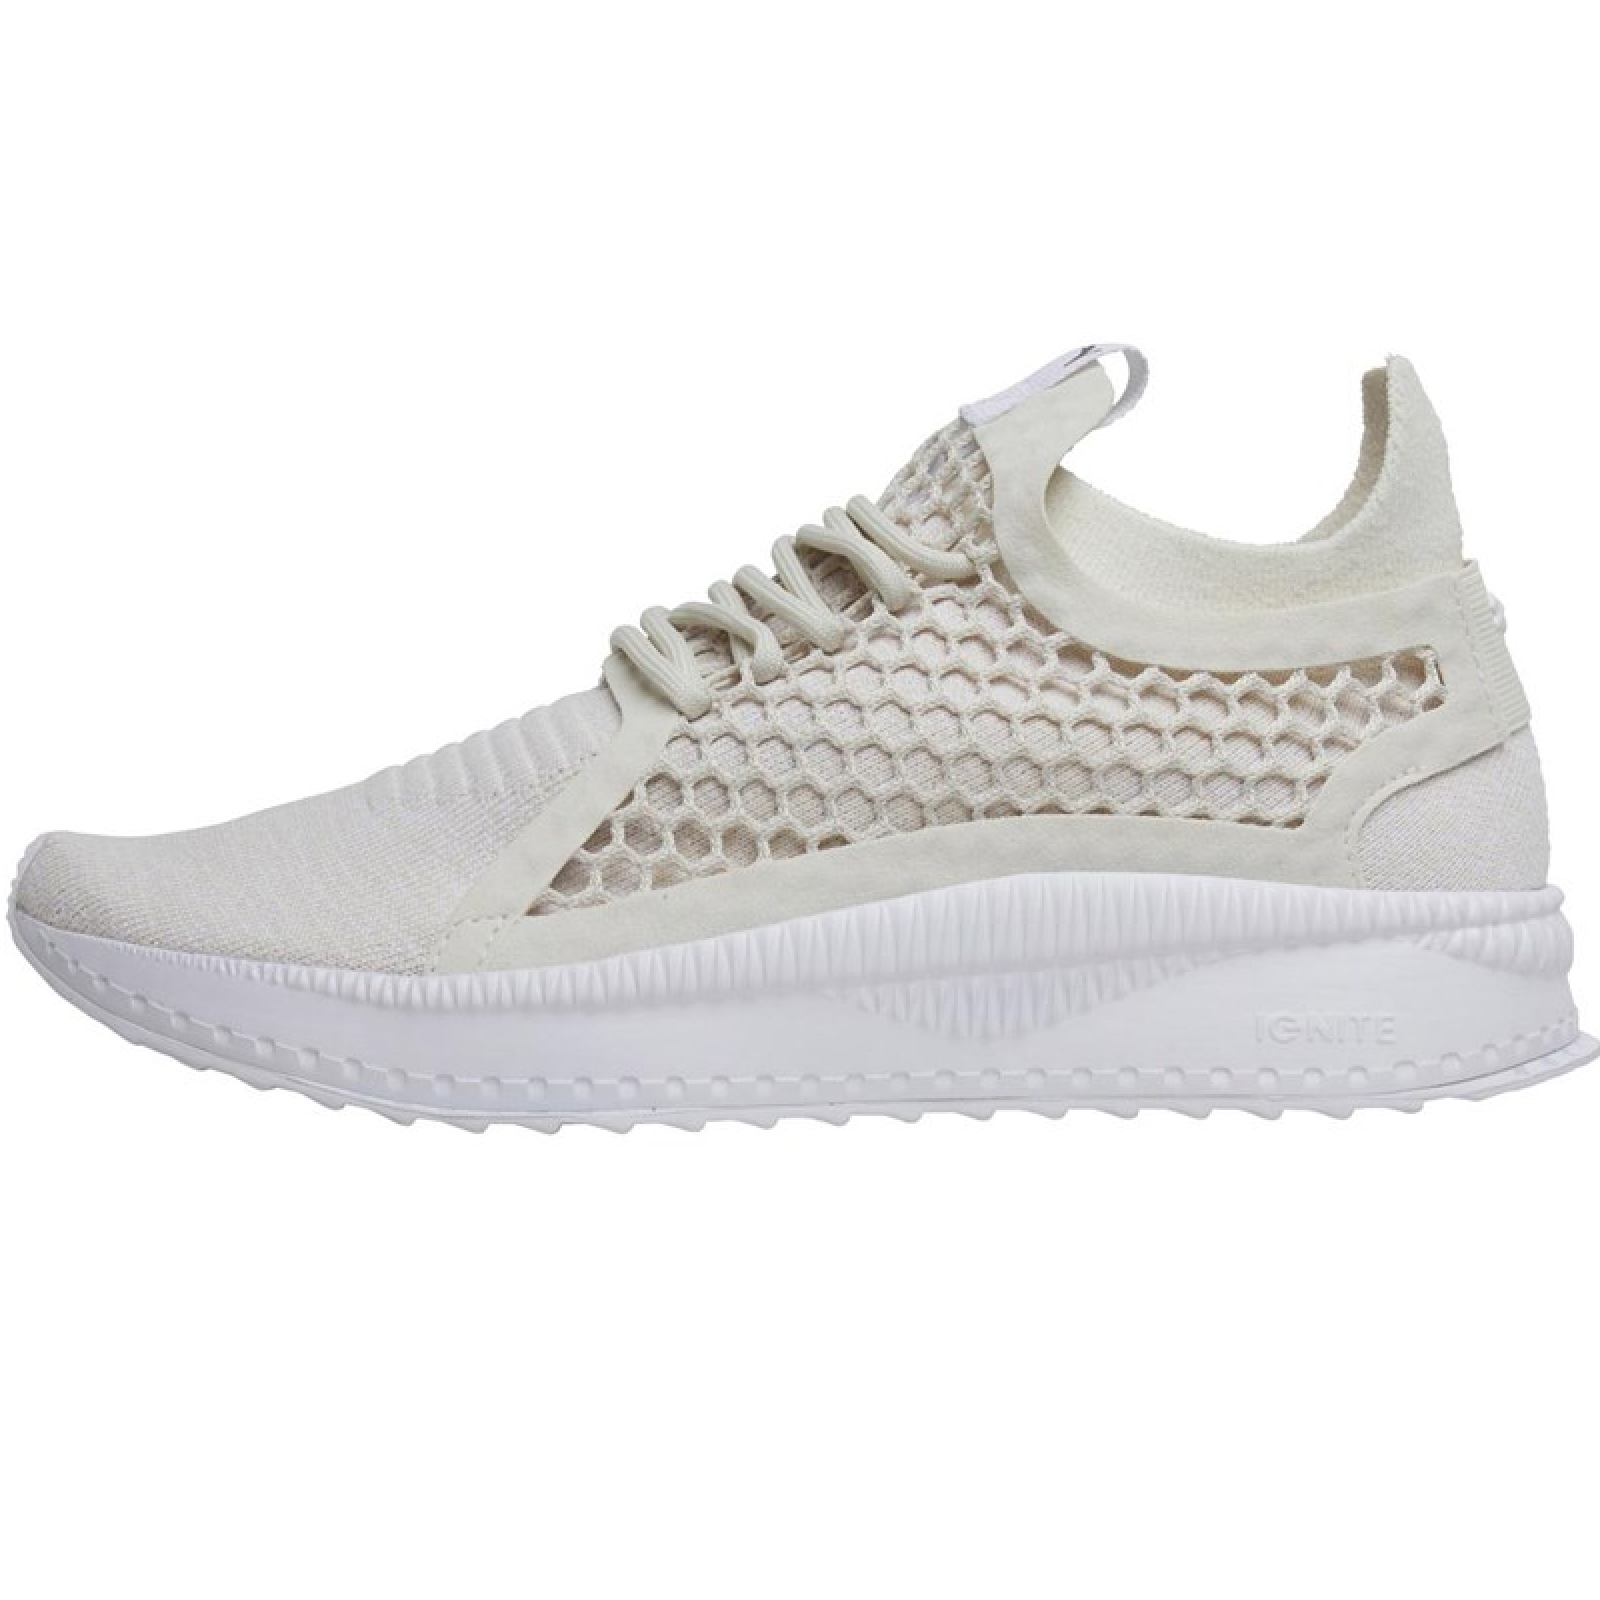 Puma Tsugi Netfit V2 EvoKnit Sneaker weissbeige 365487 01